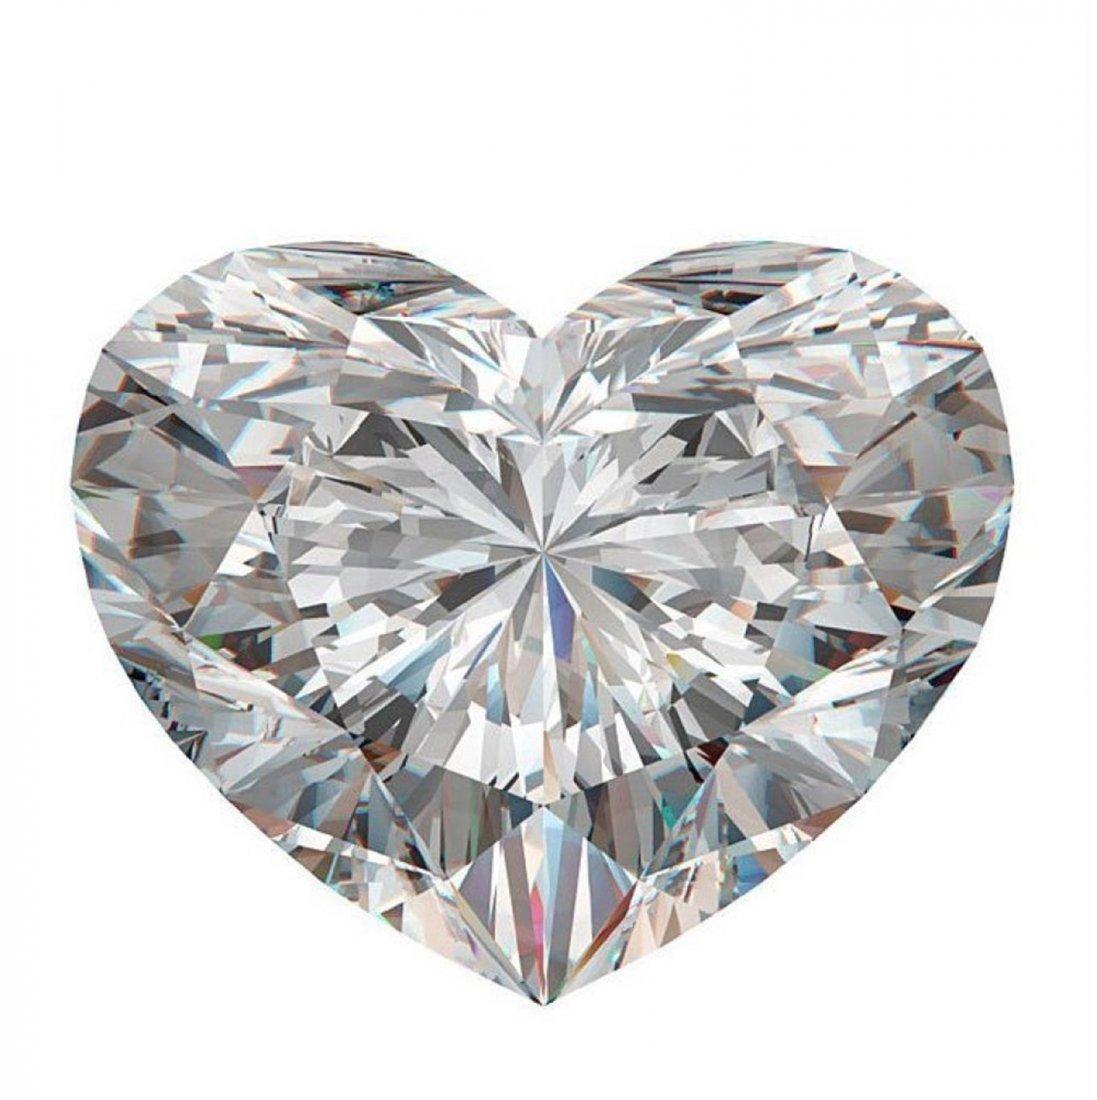 GIA/Heart/F/IF/1.02Ct